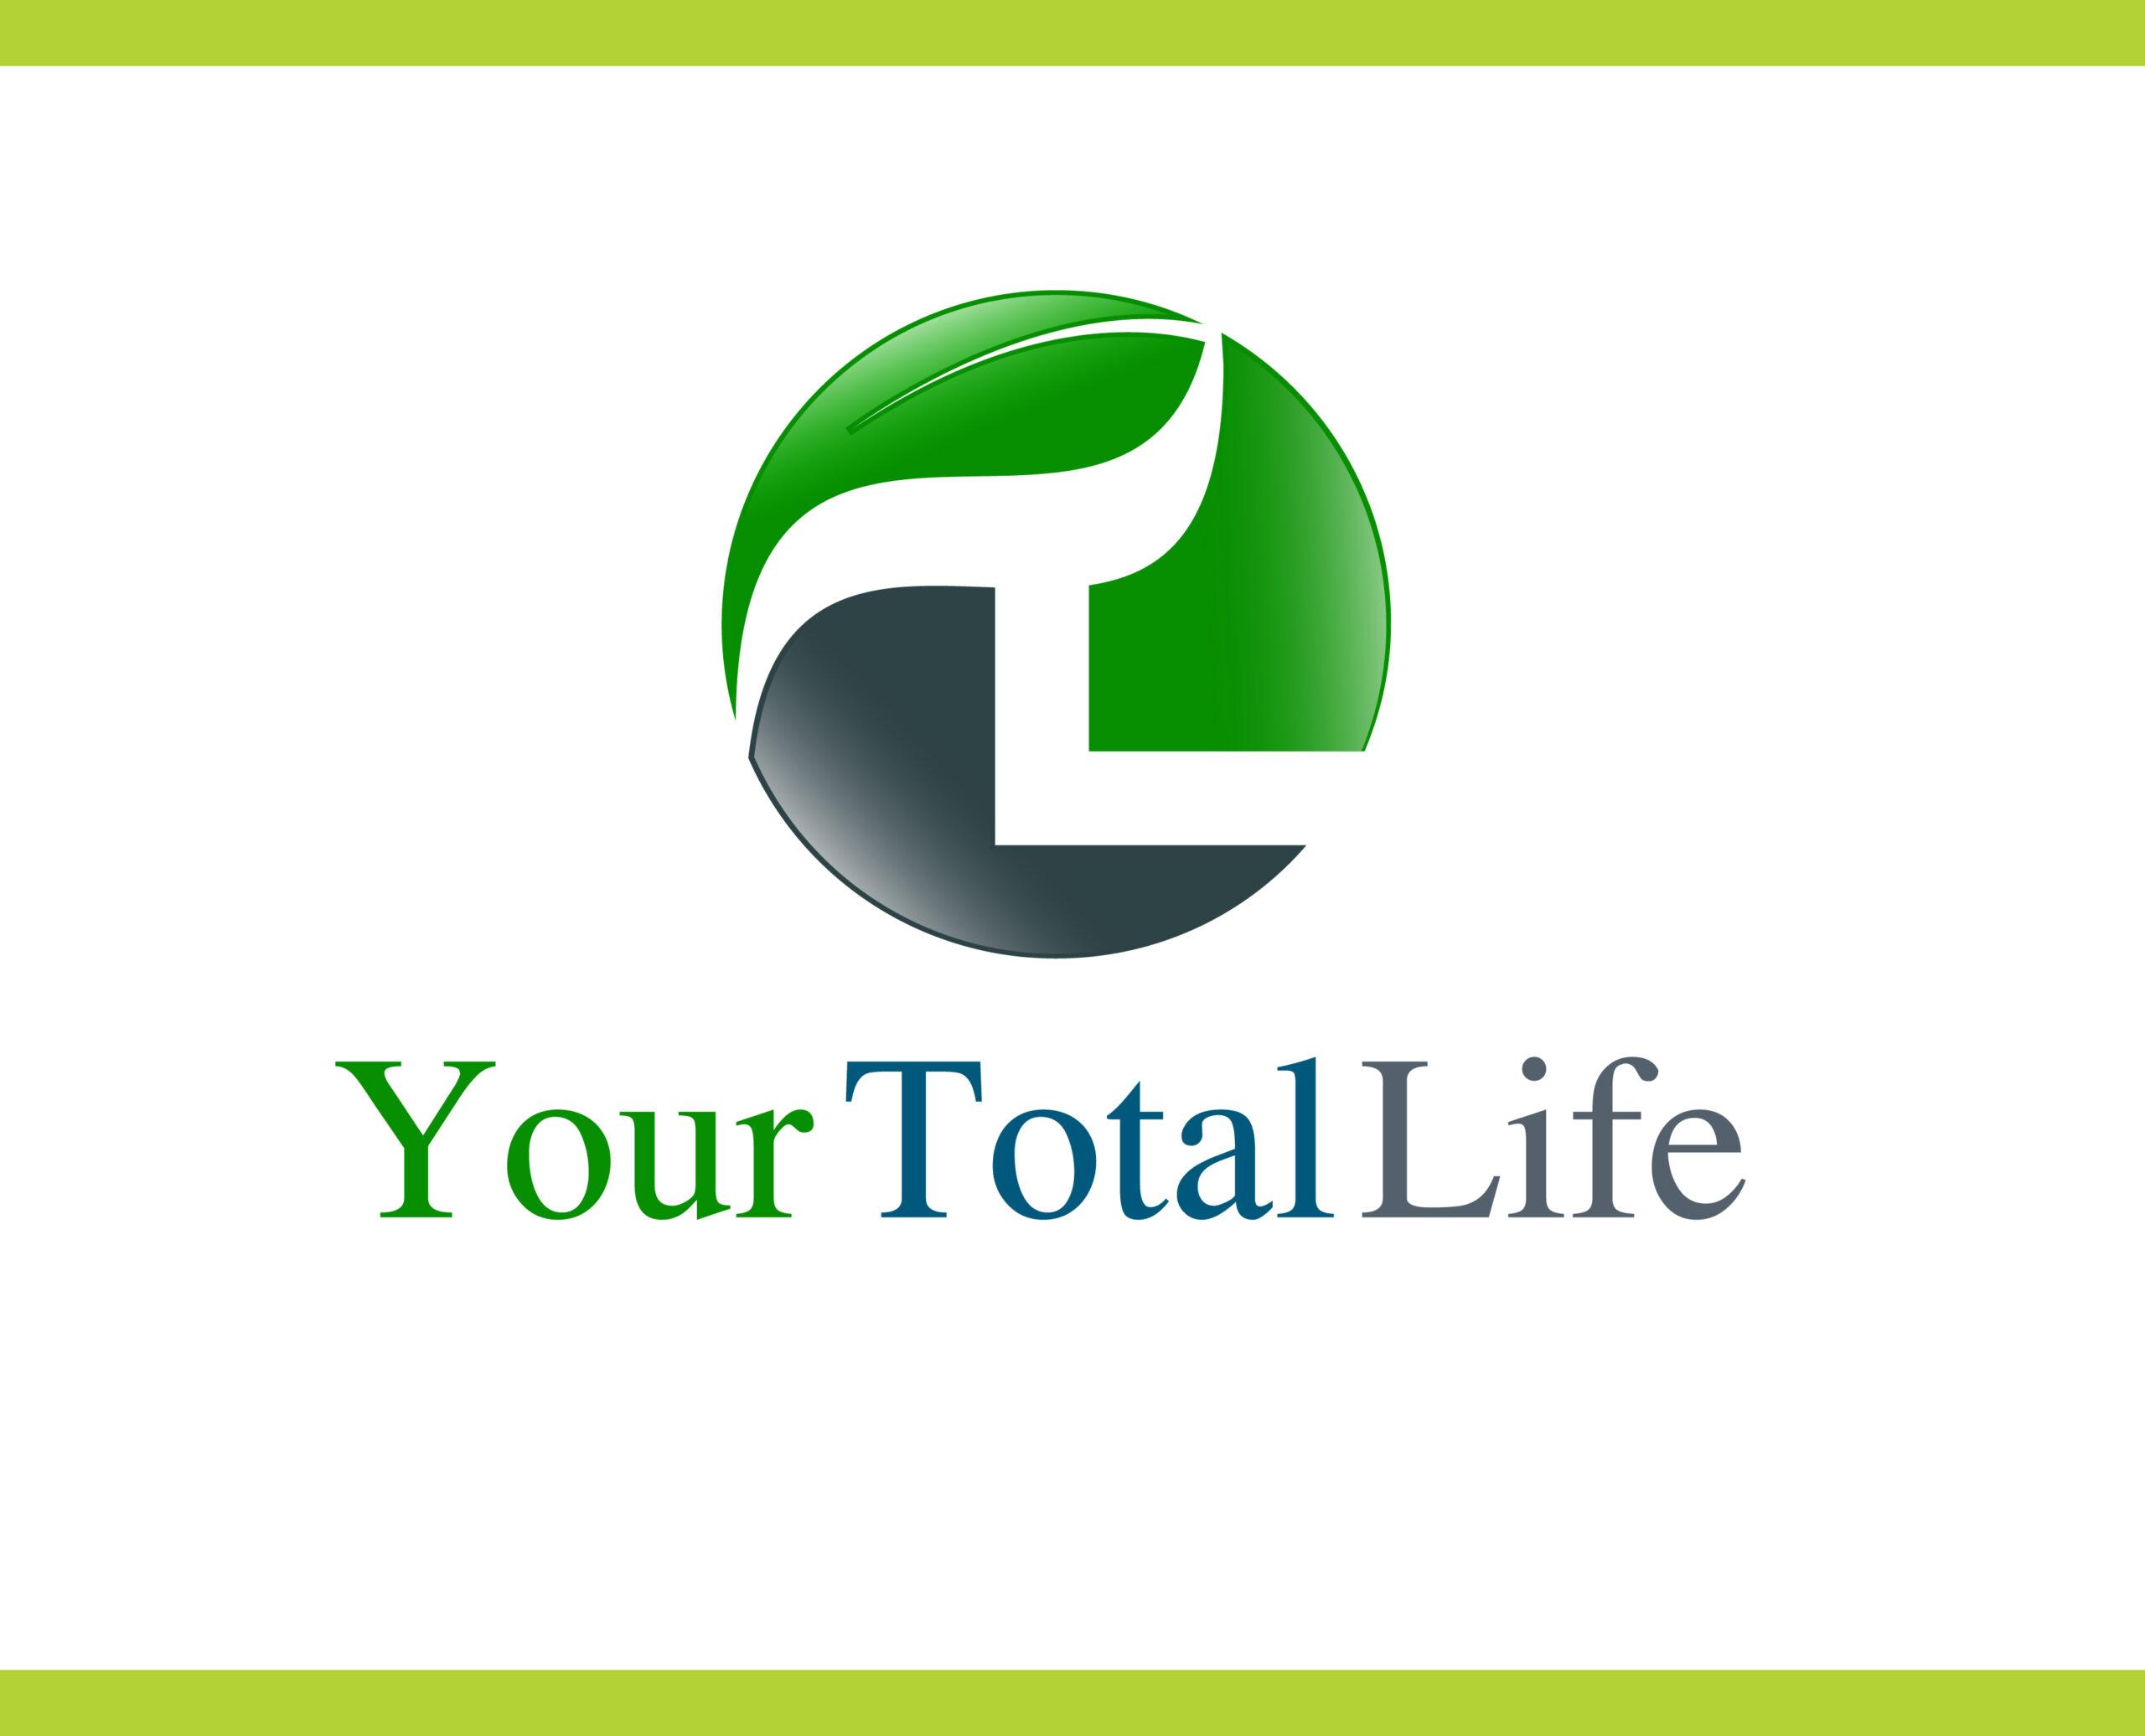 Your Total Life Best Custom Logo Design Template Vector Free Download